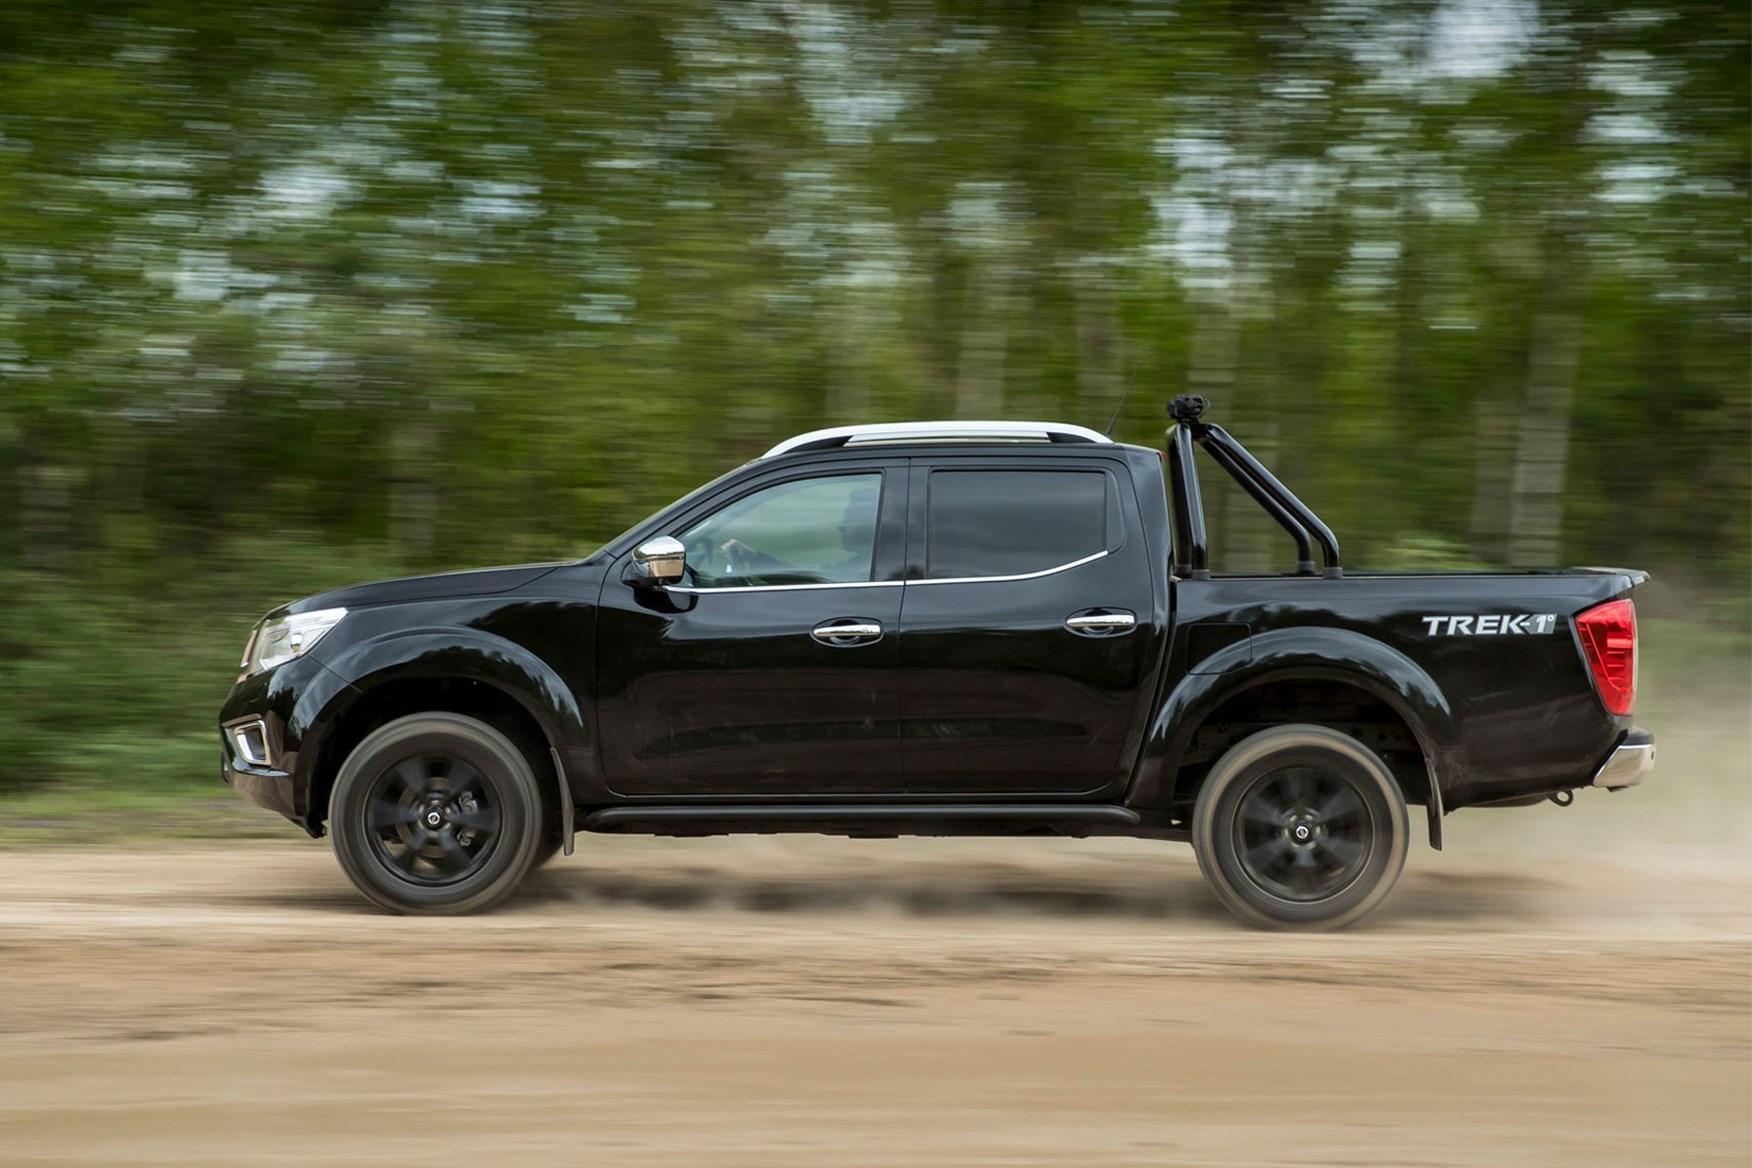 Nissan Navara Trek-1 review - side view, black, driving